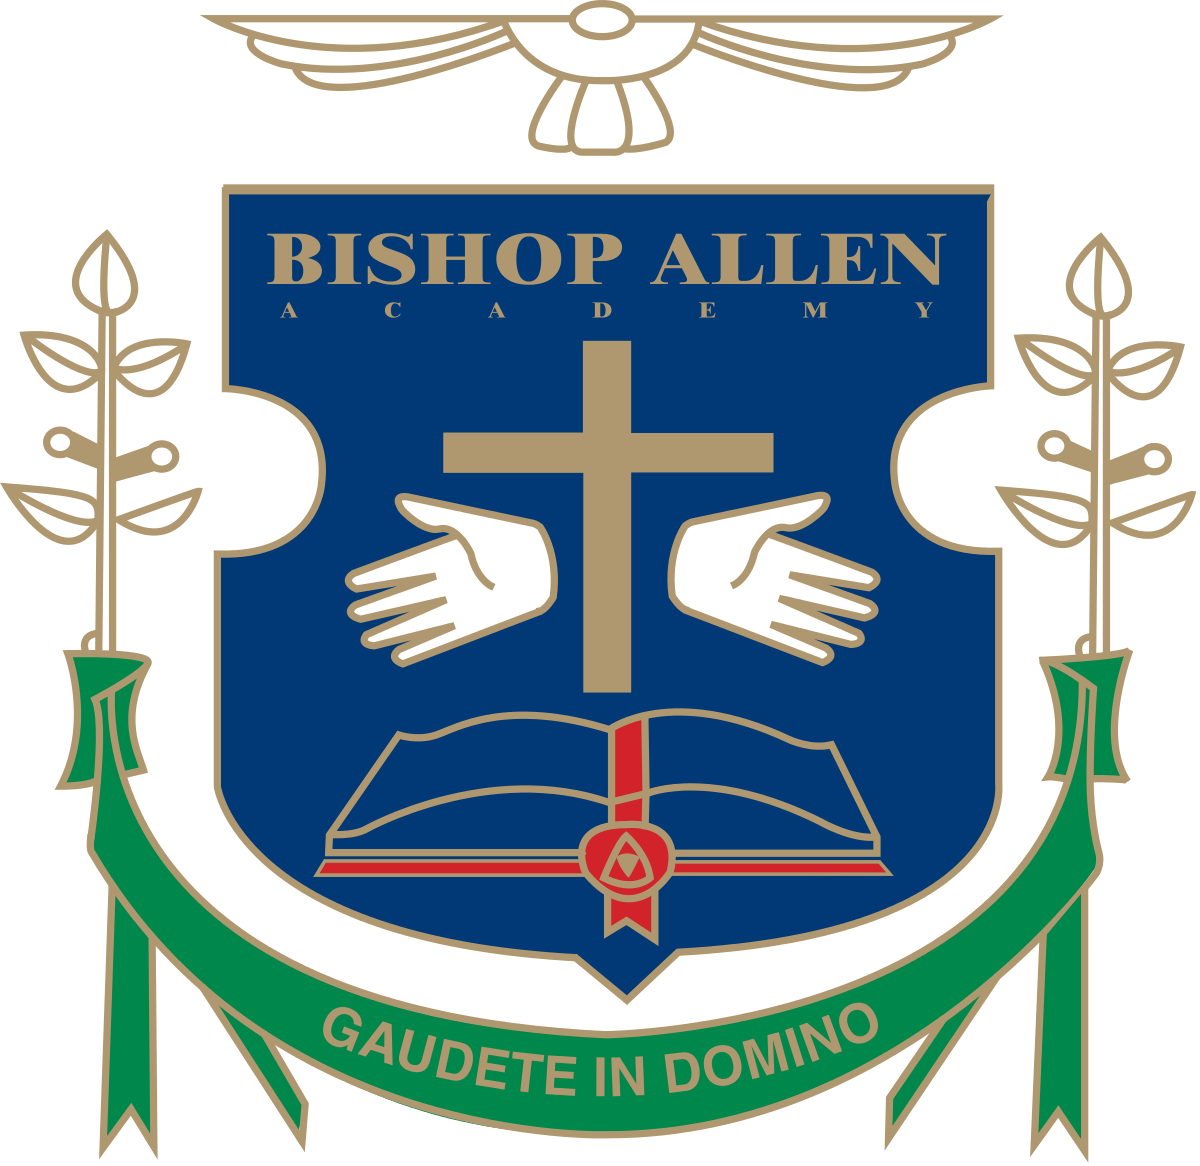 Trường Trung Học Bishop Allen Academy – Etobicoke, Ontario, Canada